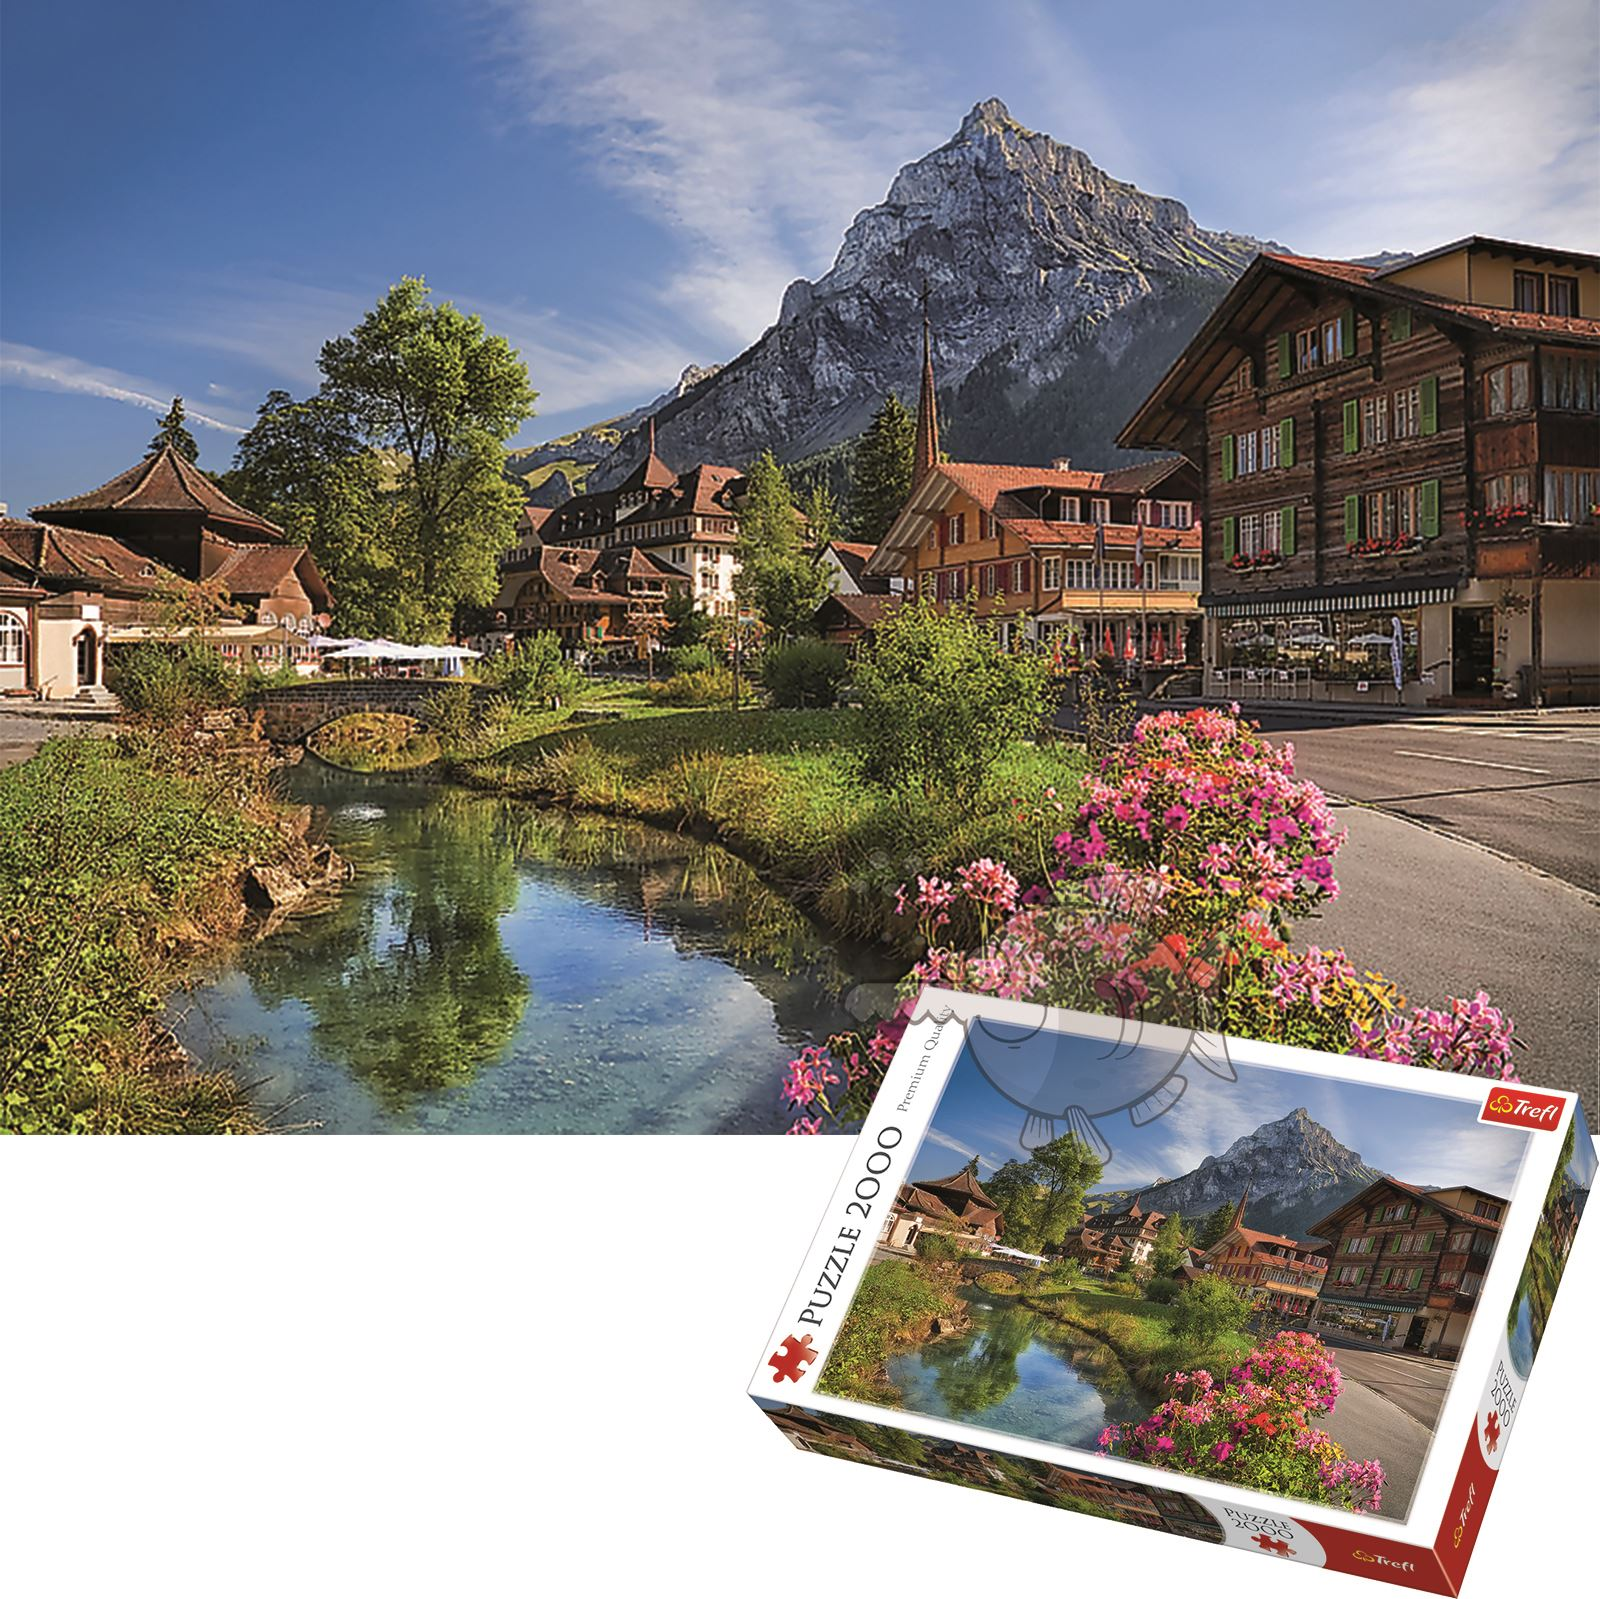 Trefl-300-500-1000-1500-2000-3000-4000-6000-Piece-Jigsaw-Puzzle-Landscapes-City thumbnail 17